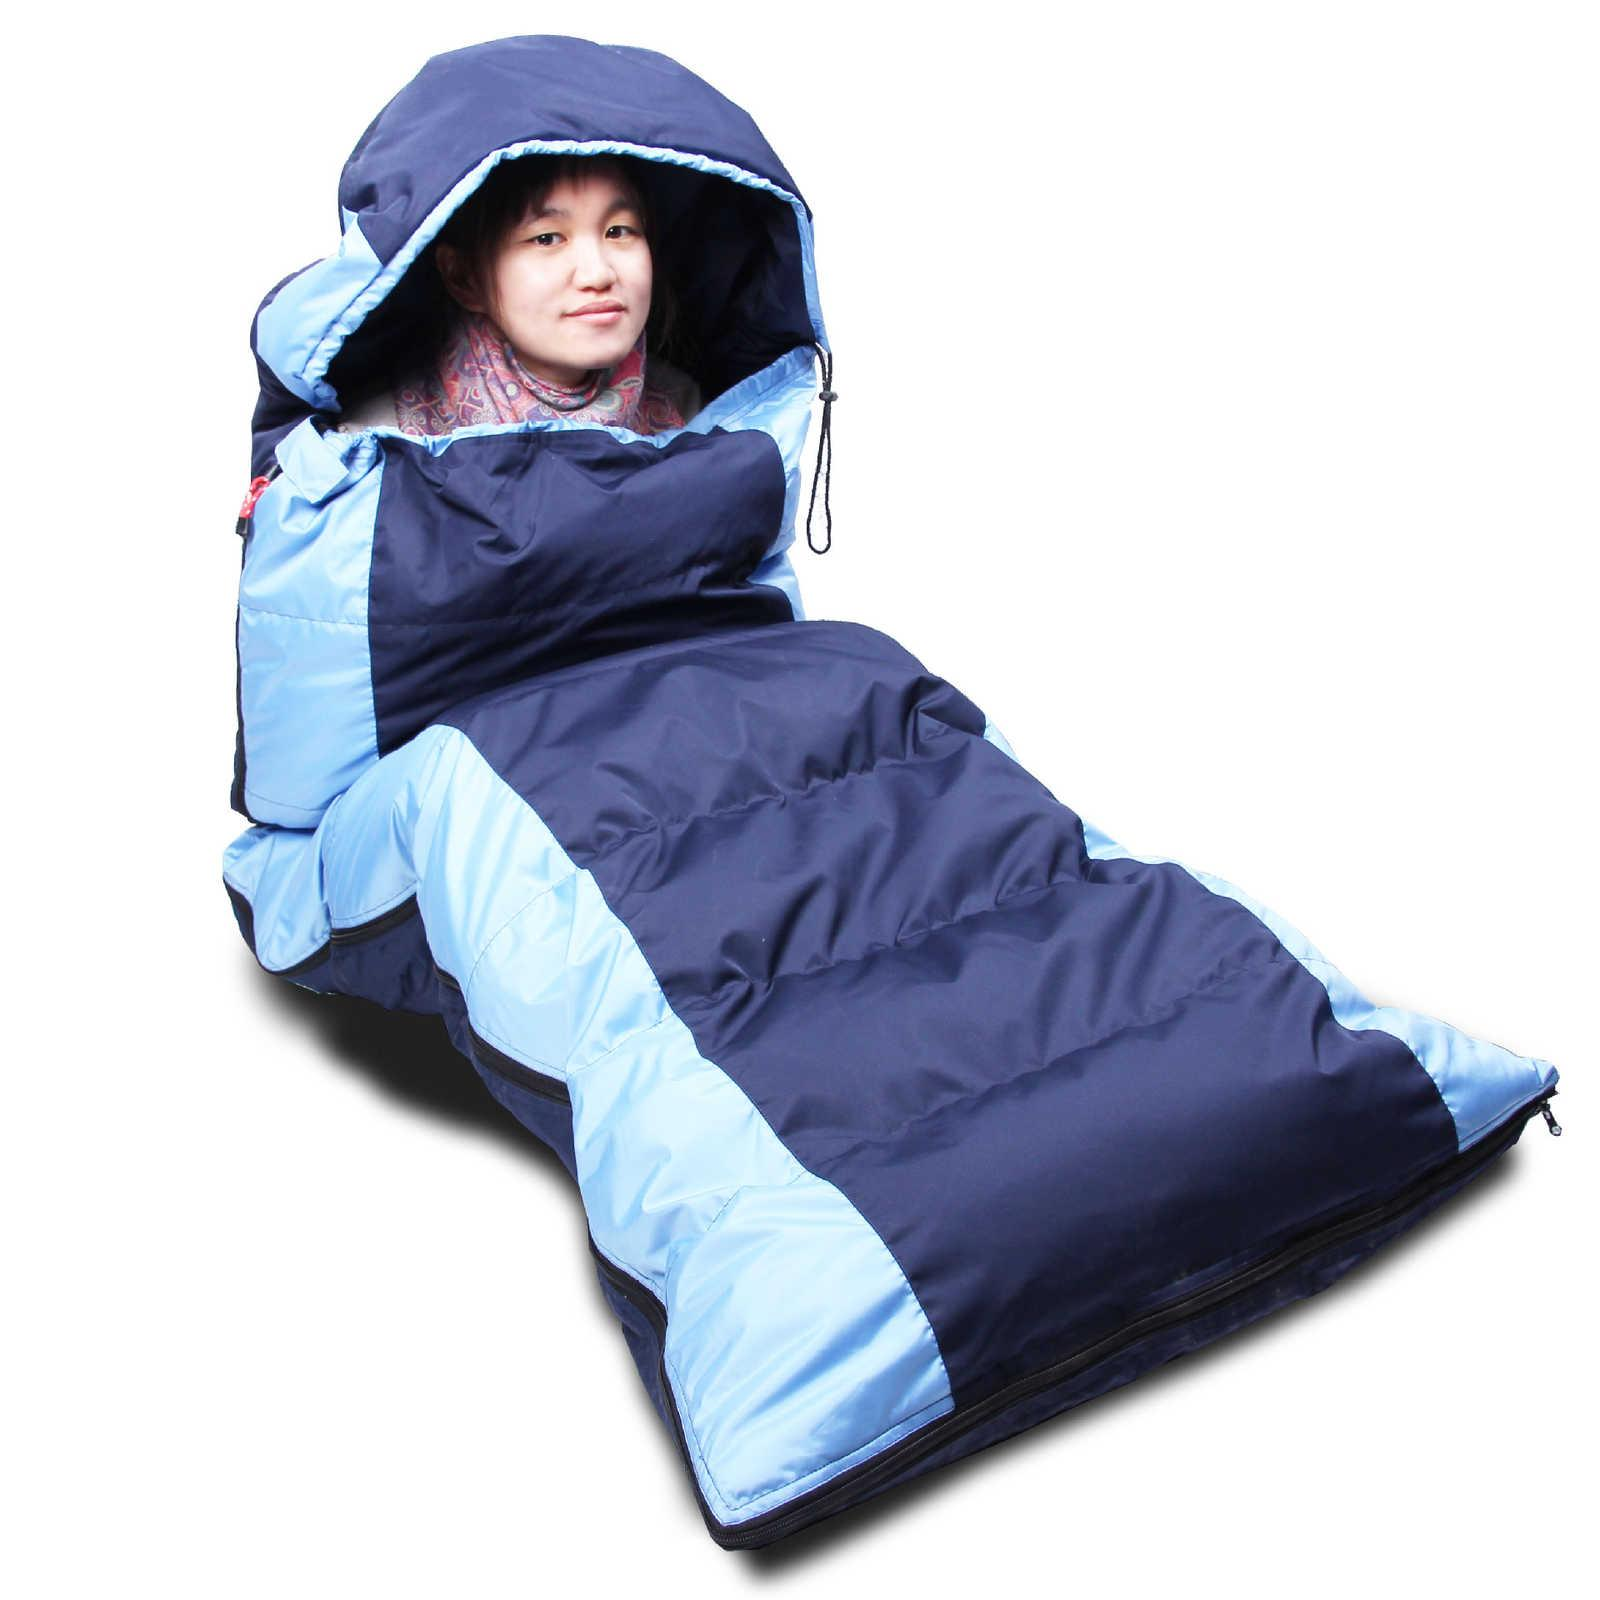 Feituo special outdoor runter camping warme erwachsene umhülle Mittagspause Schlafsack